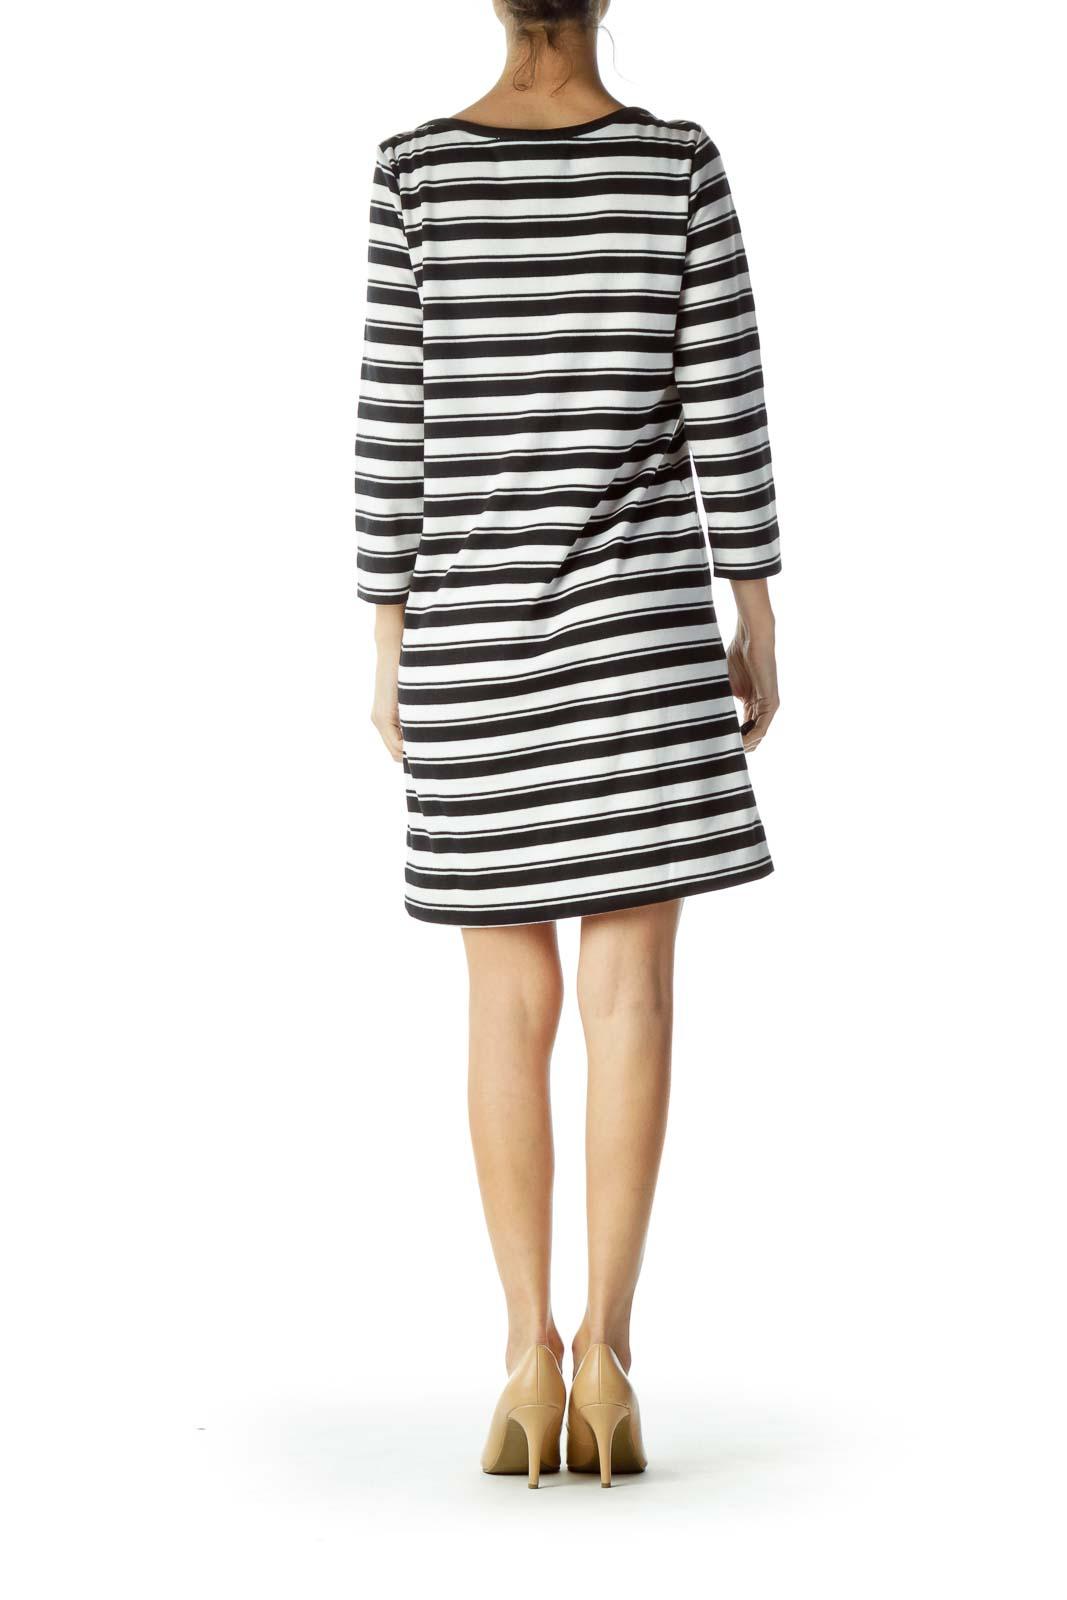 Black White Striped 3/4 Sleeve Knit Dress